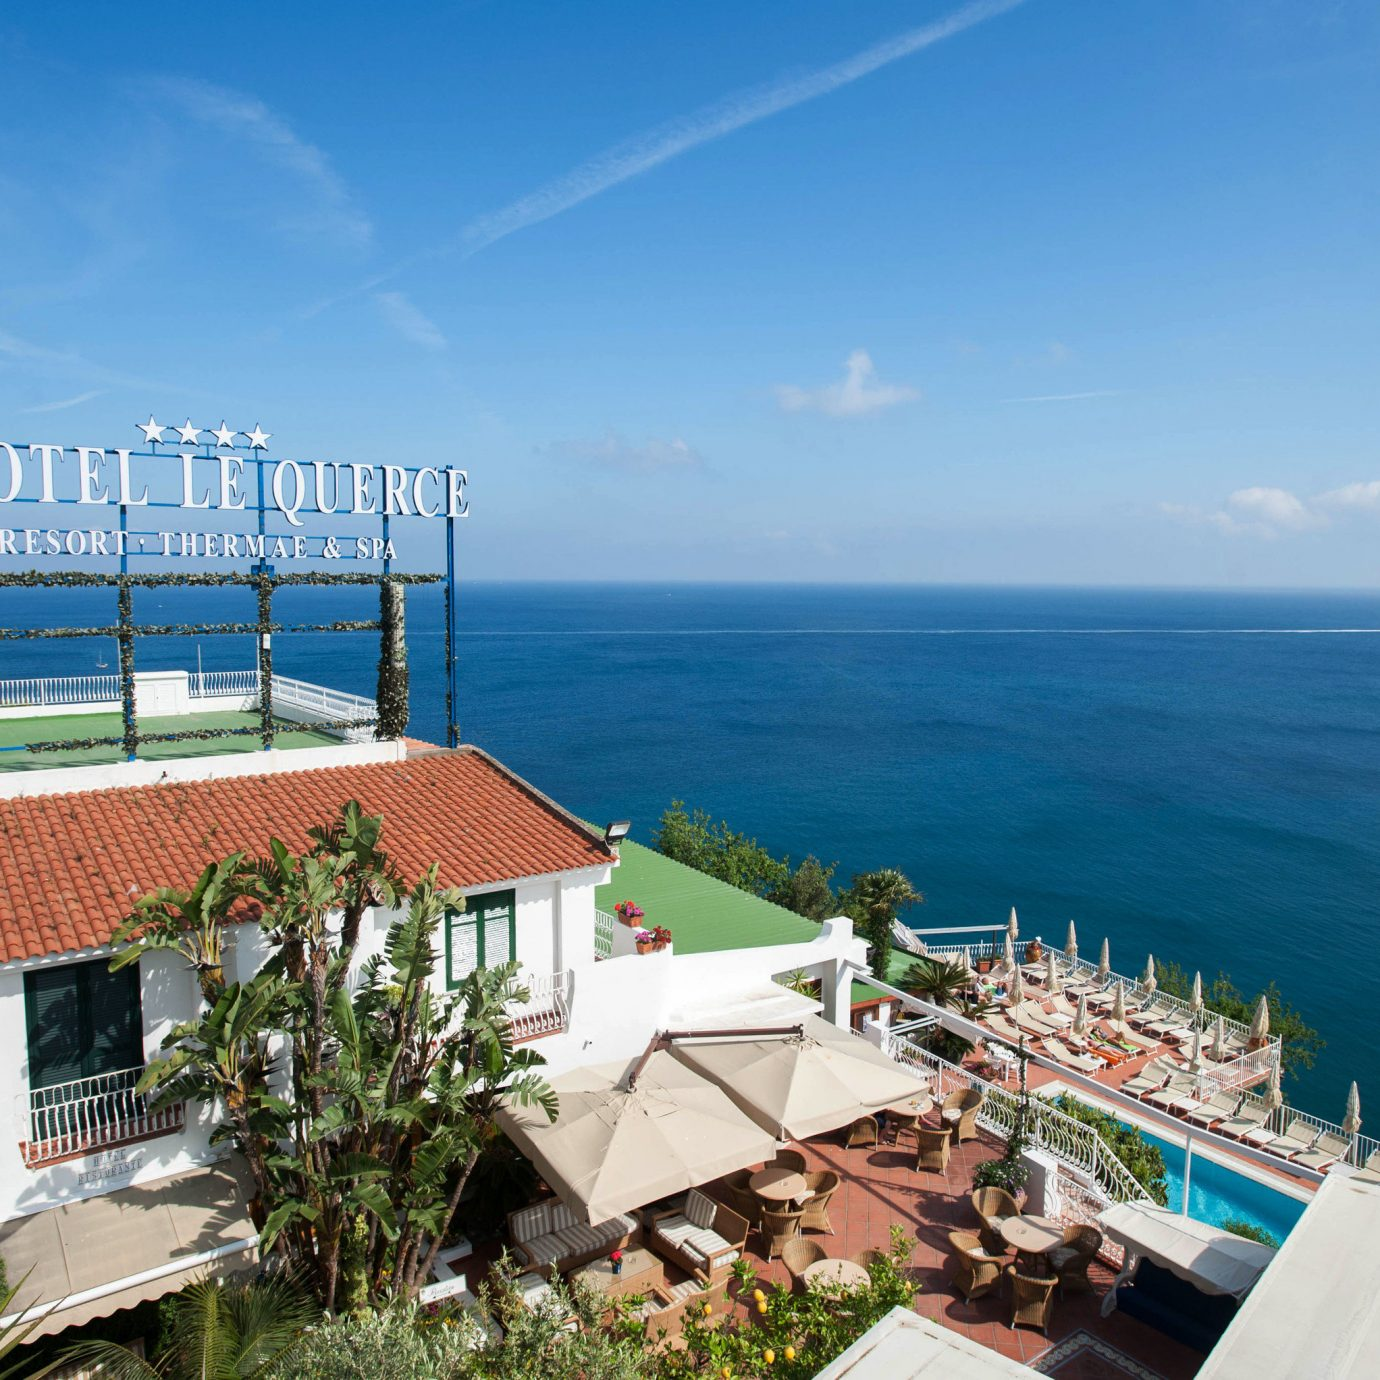 sky property Sea caribbean Ocean Coast Resort Beach cape marina dock Deck shore